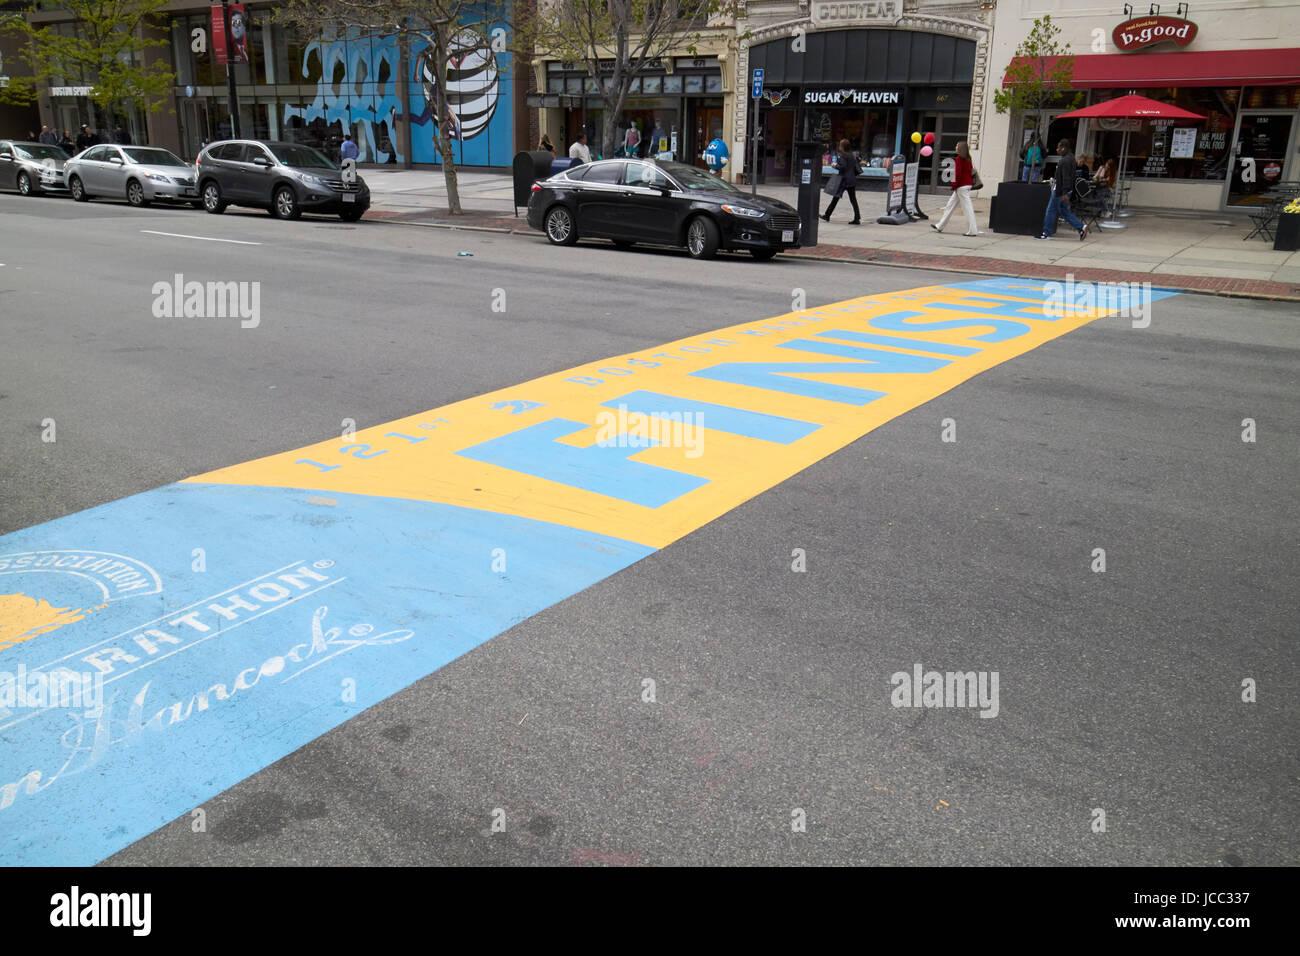 Maratona di Boston traguardo Boylston Street USA Immagini Stock